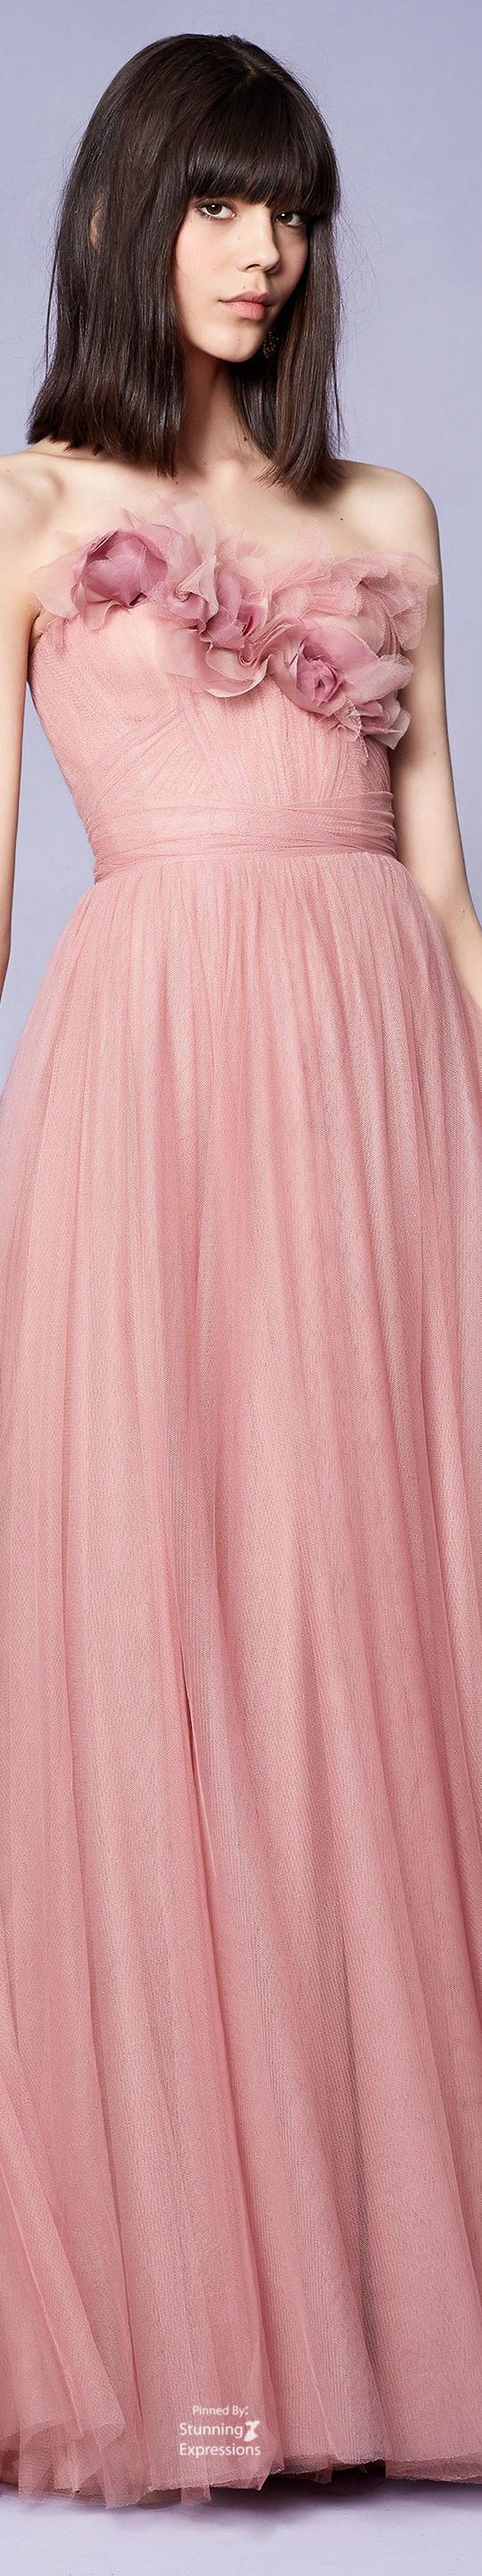 Marchesa Resort 2018 | resortdress | Pinterest | Elegante ...